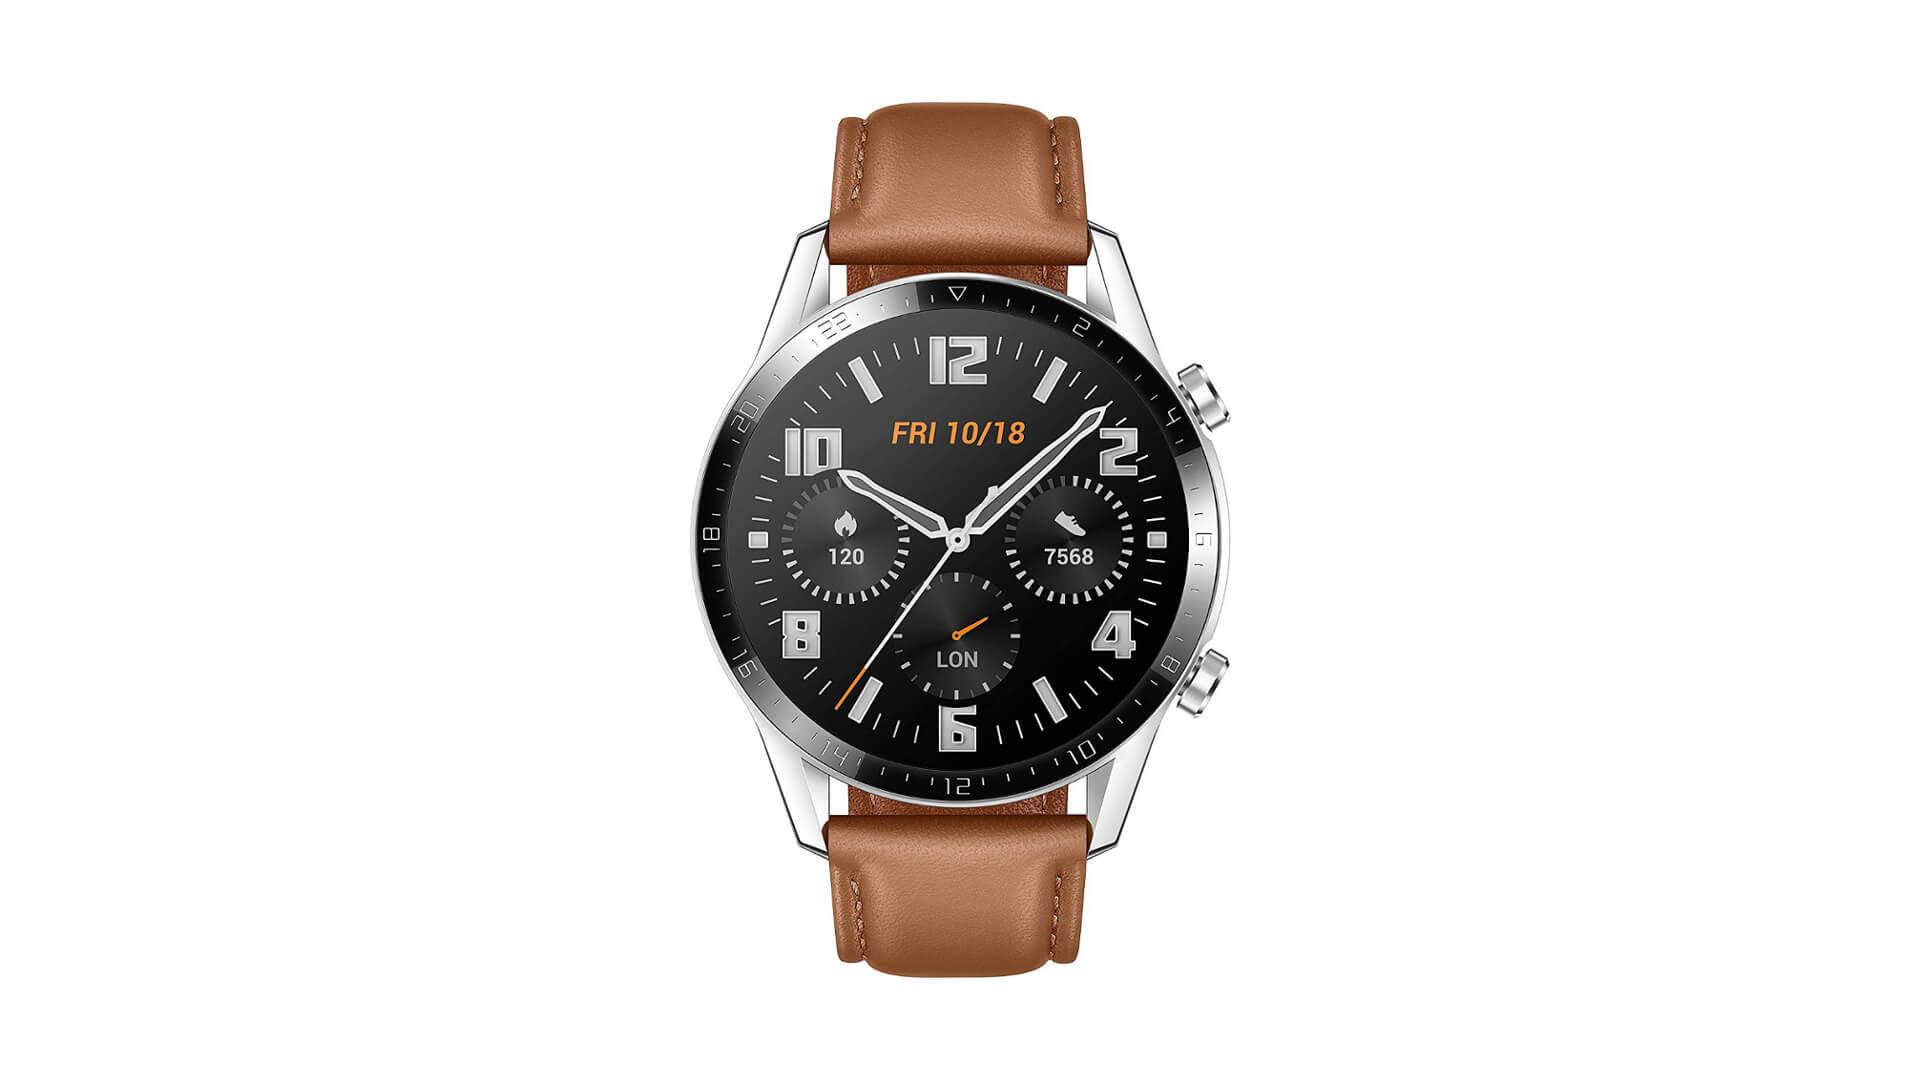 Review Huawei Watch GT2 46mm: Excelente herramienta para deportes, autonomía destacable